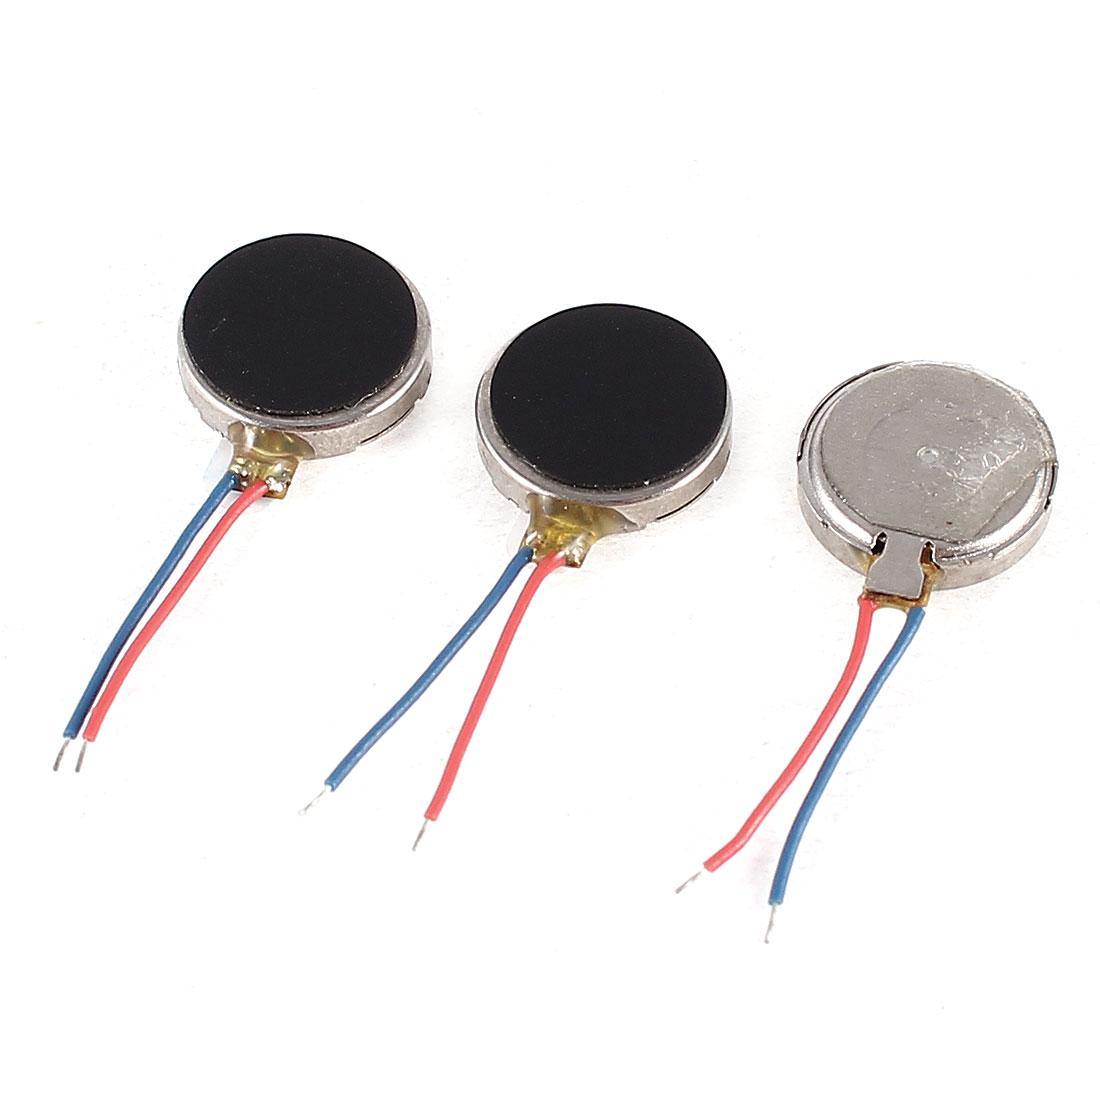 10mm-x-2-7mm-Cellphone-Toy-Vibration-DC-Micro-Motor-3V-3-Pcs